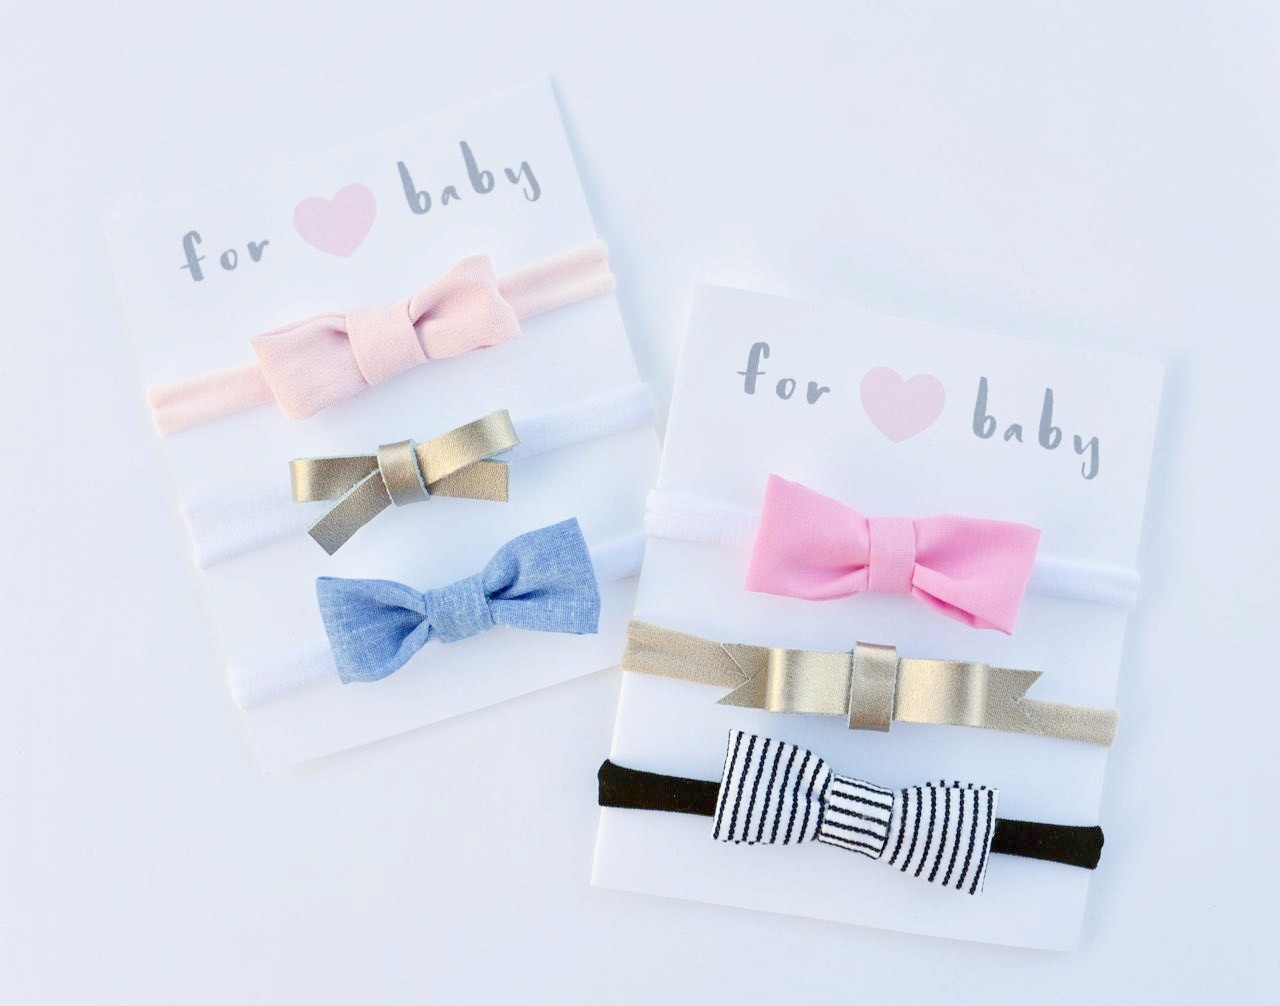 Free Printable Hair Bow Cards For Diy Hair Bows And Headbands - Make - Free Printable Hair Bow Templates